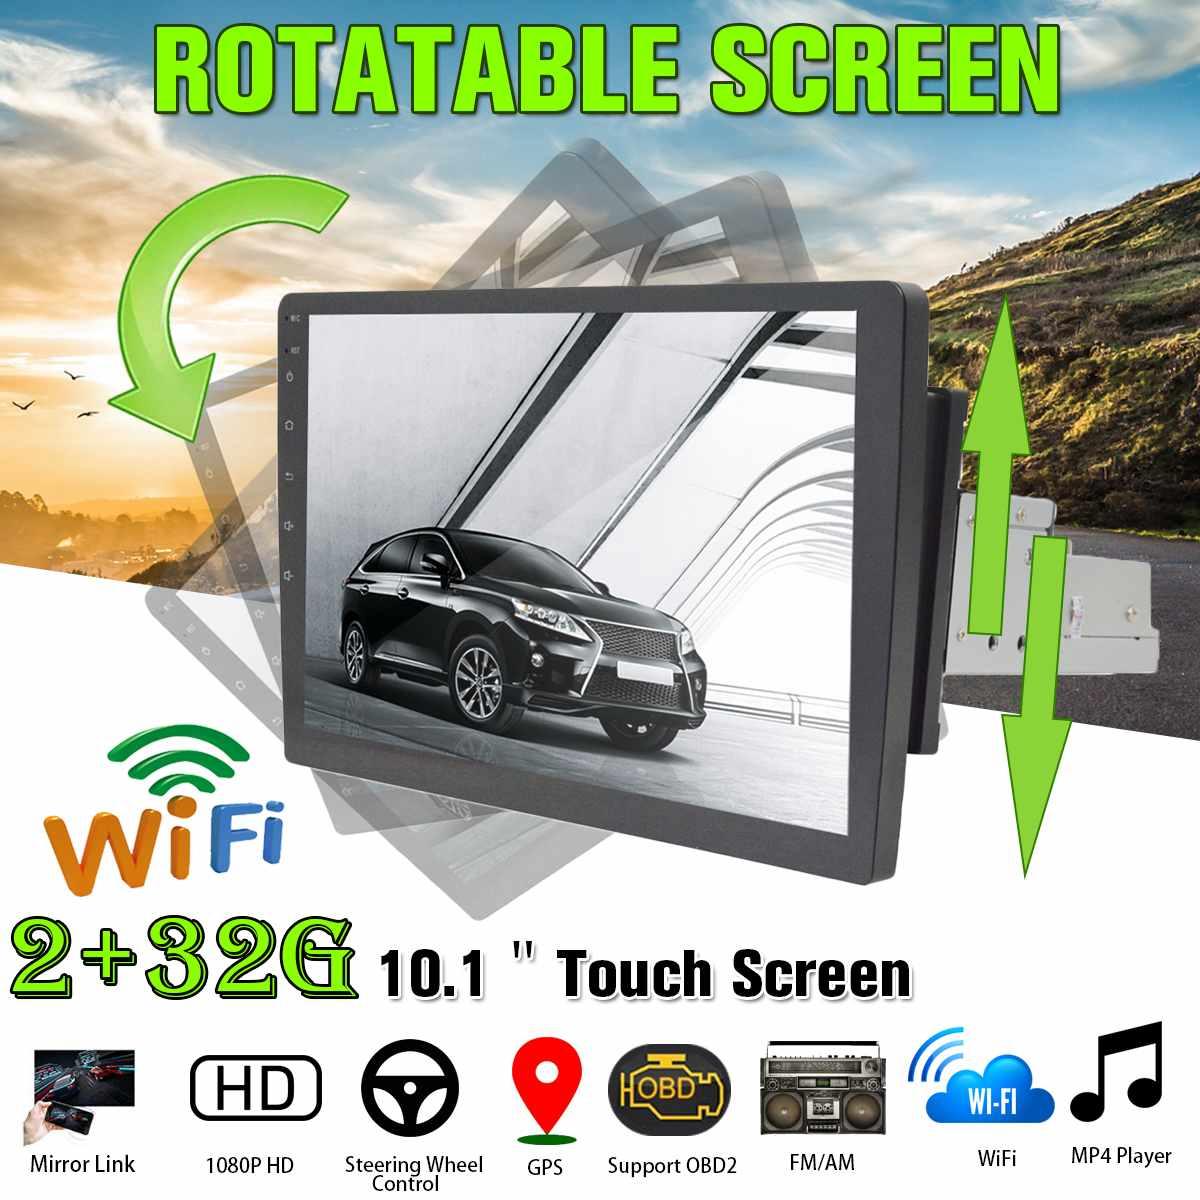 2G + 32G Rotatif Voiture Lecteur Multimédia 10.1for Android 8.0 1Din 8 Core Autoradio GPS Nav WiFi Radio MP5 Joueur Universa